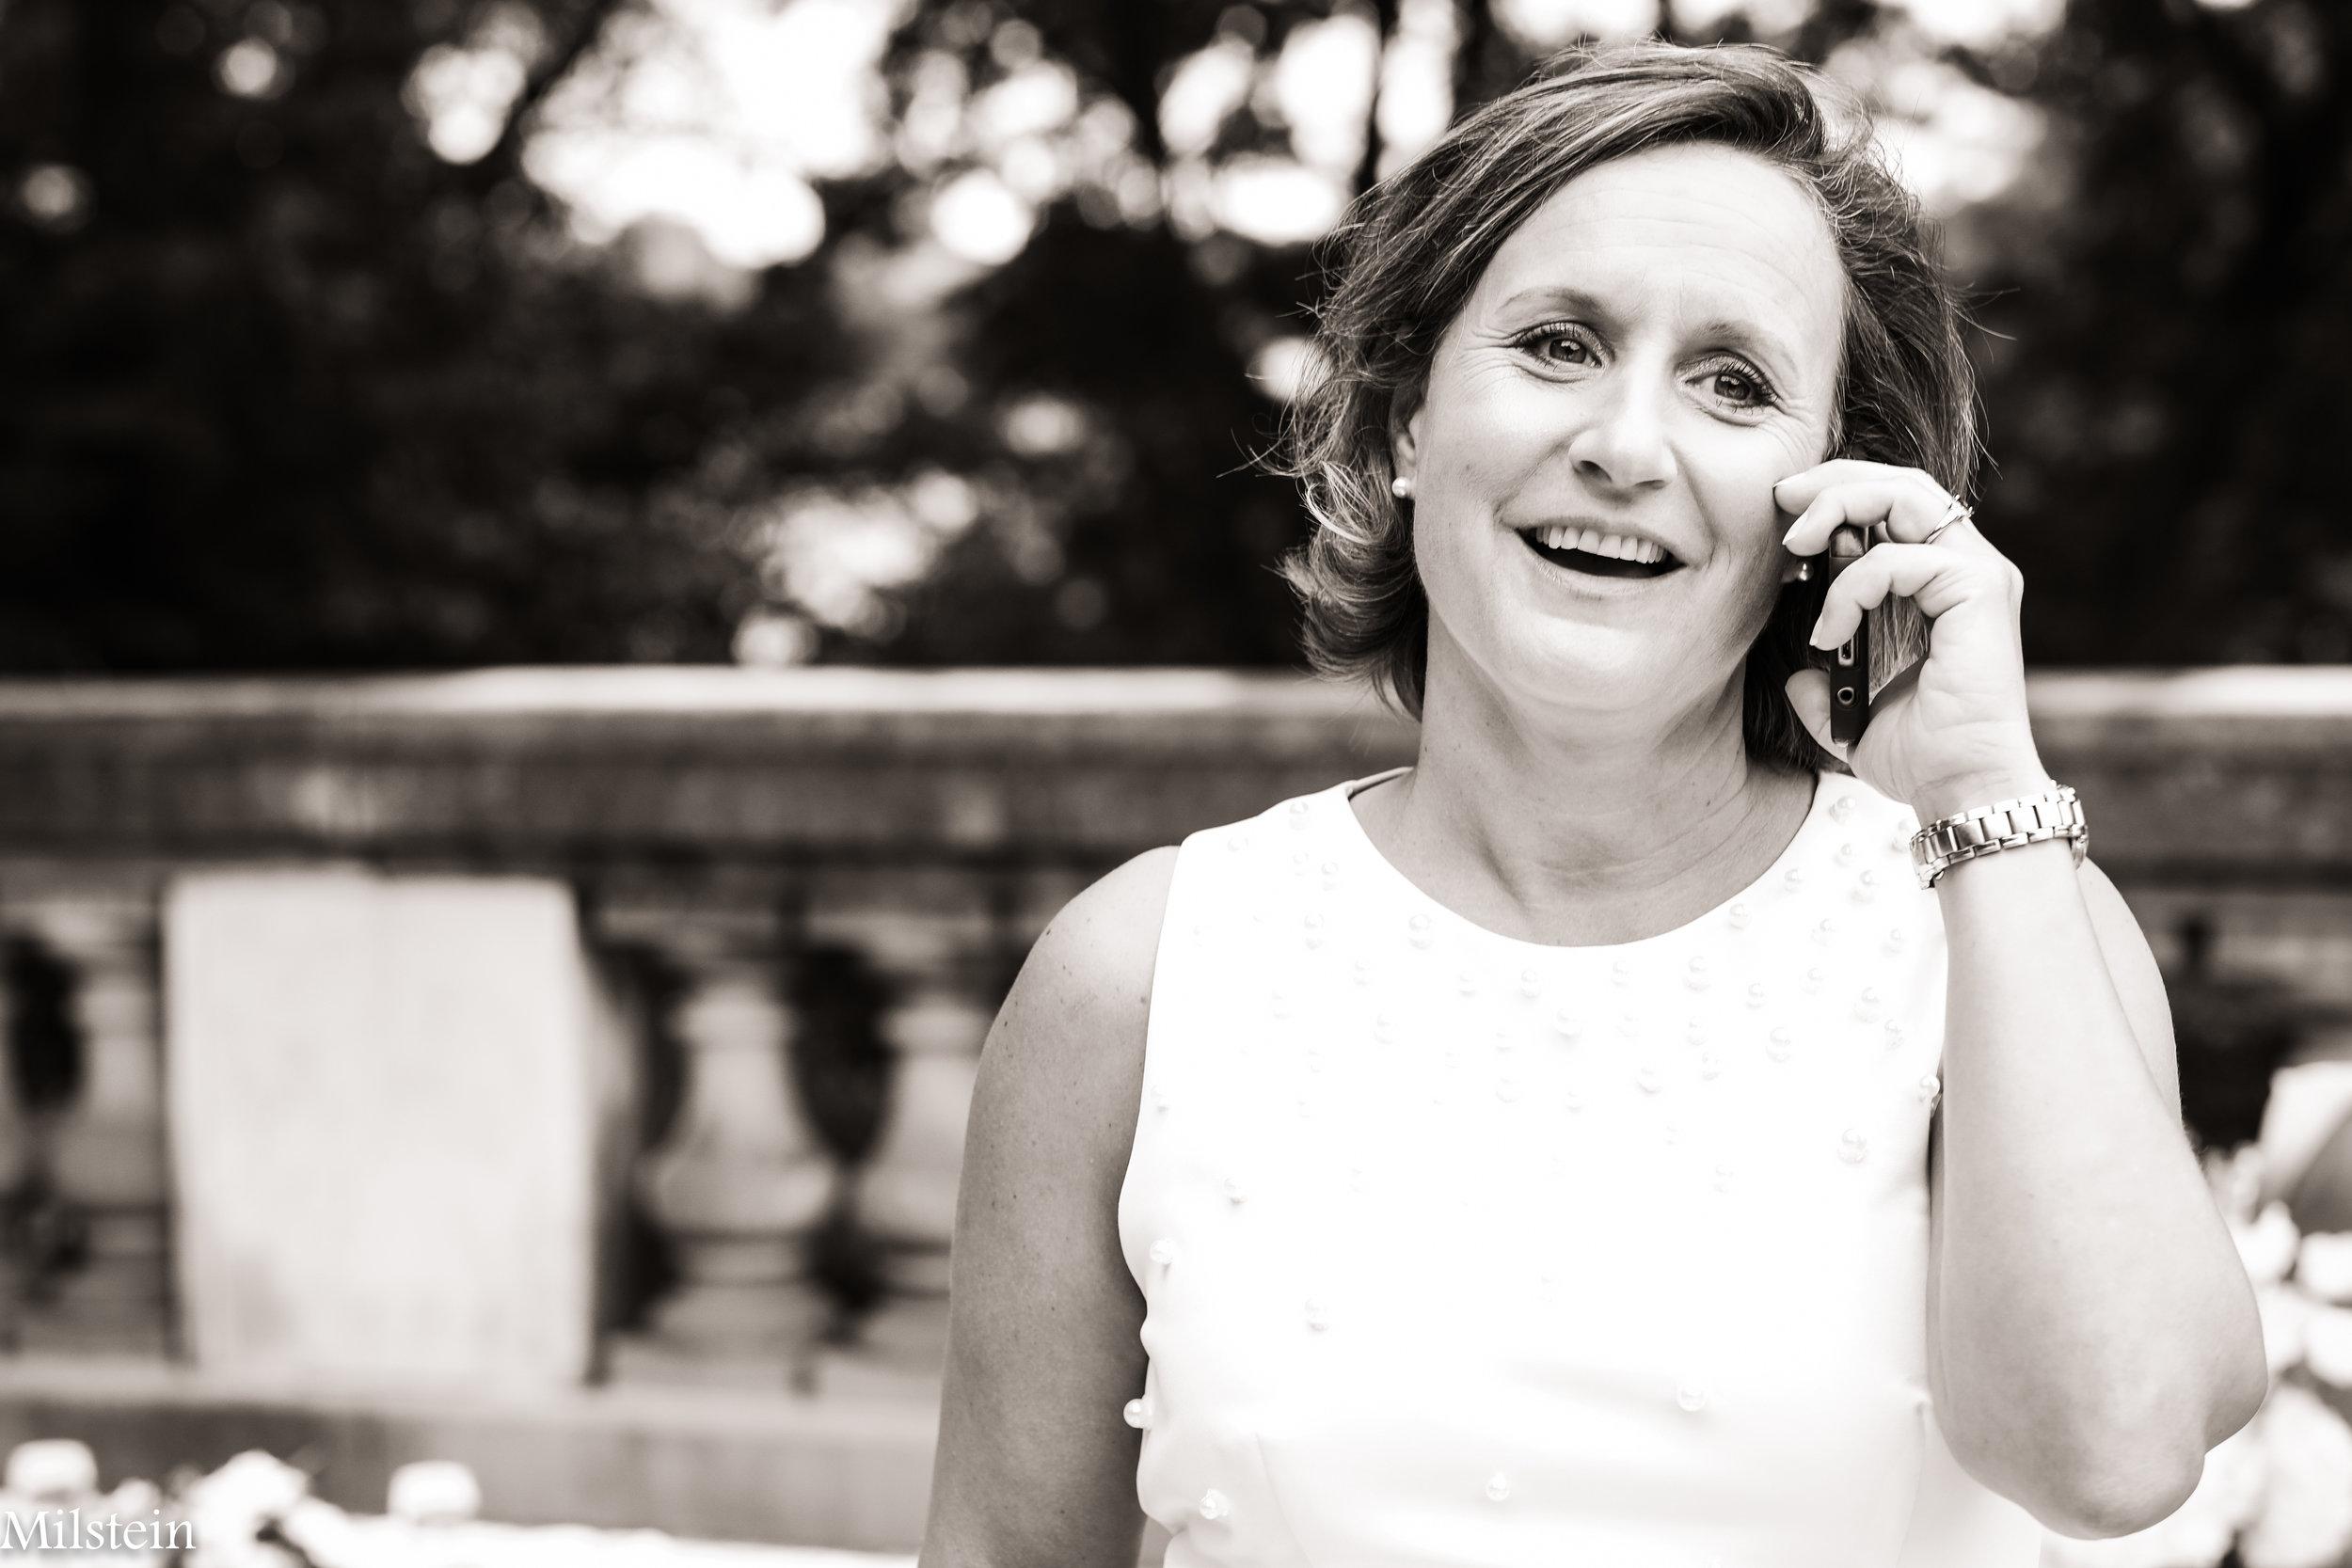 Amy Milstein - Professional Wedding Photographer New York